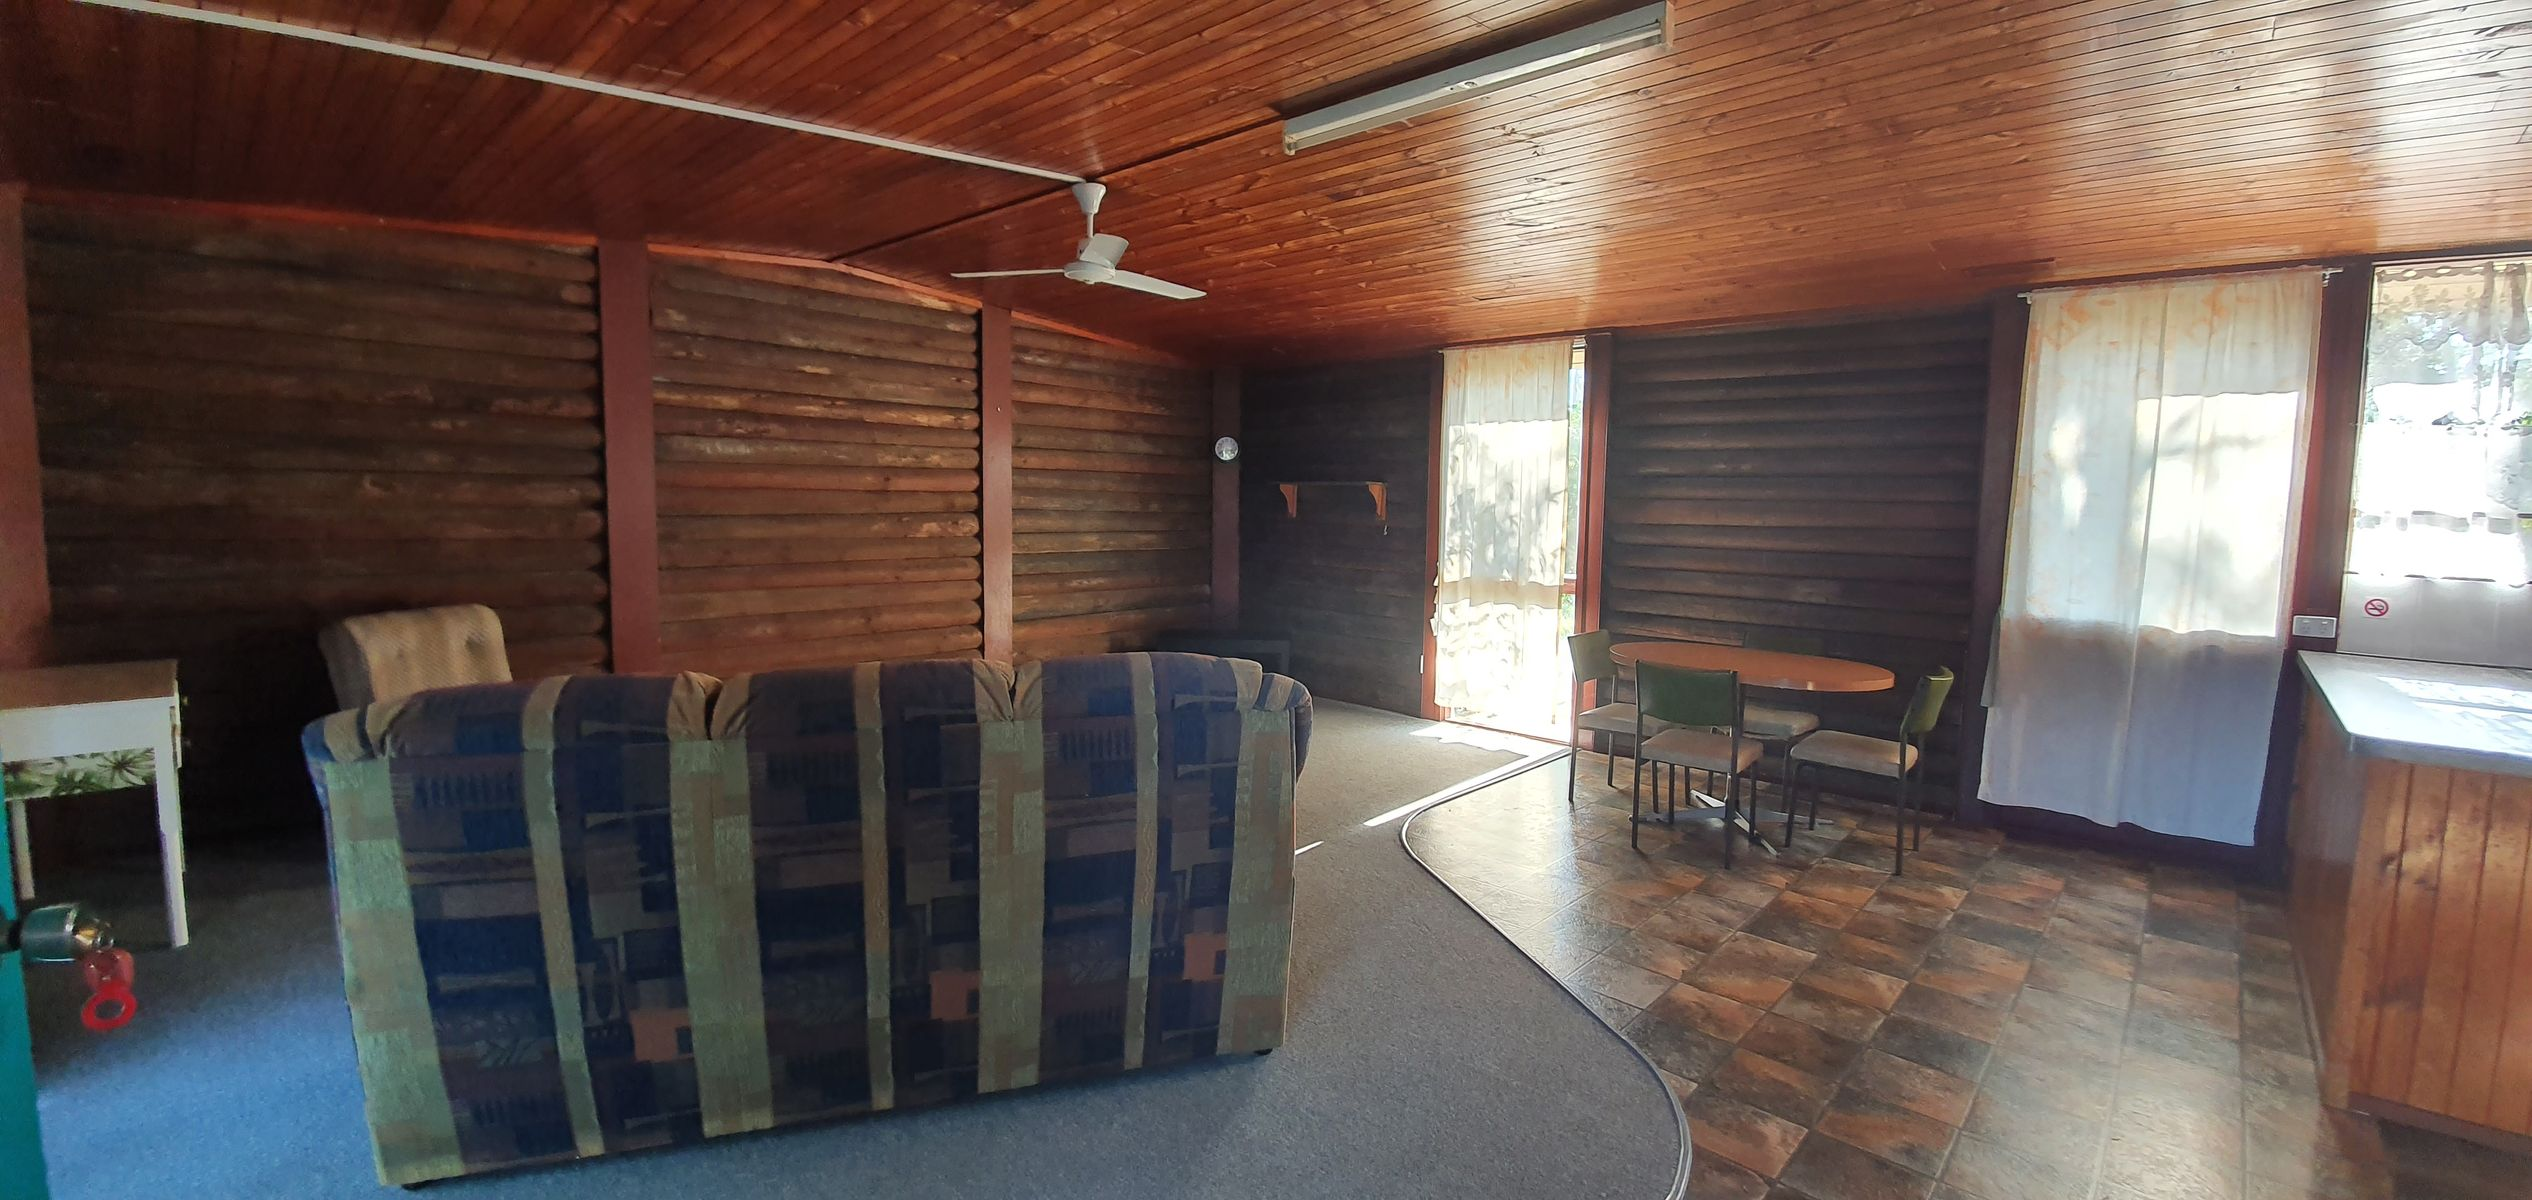 3/103 Miran Khan Drive, Freshwater Point, QLD 4737